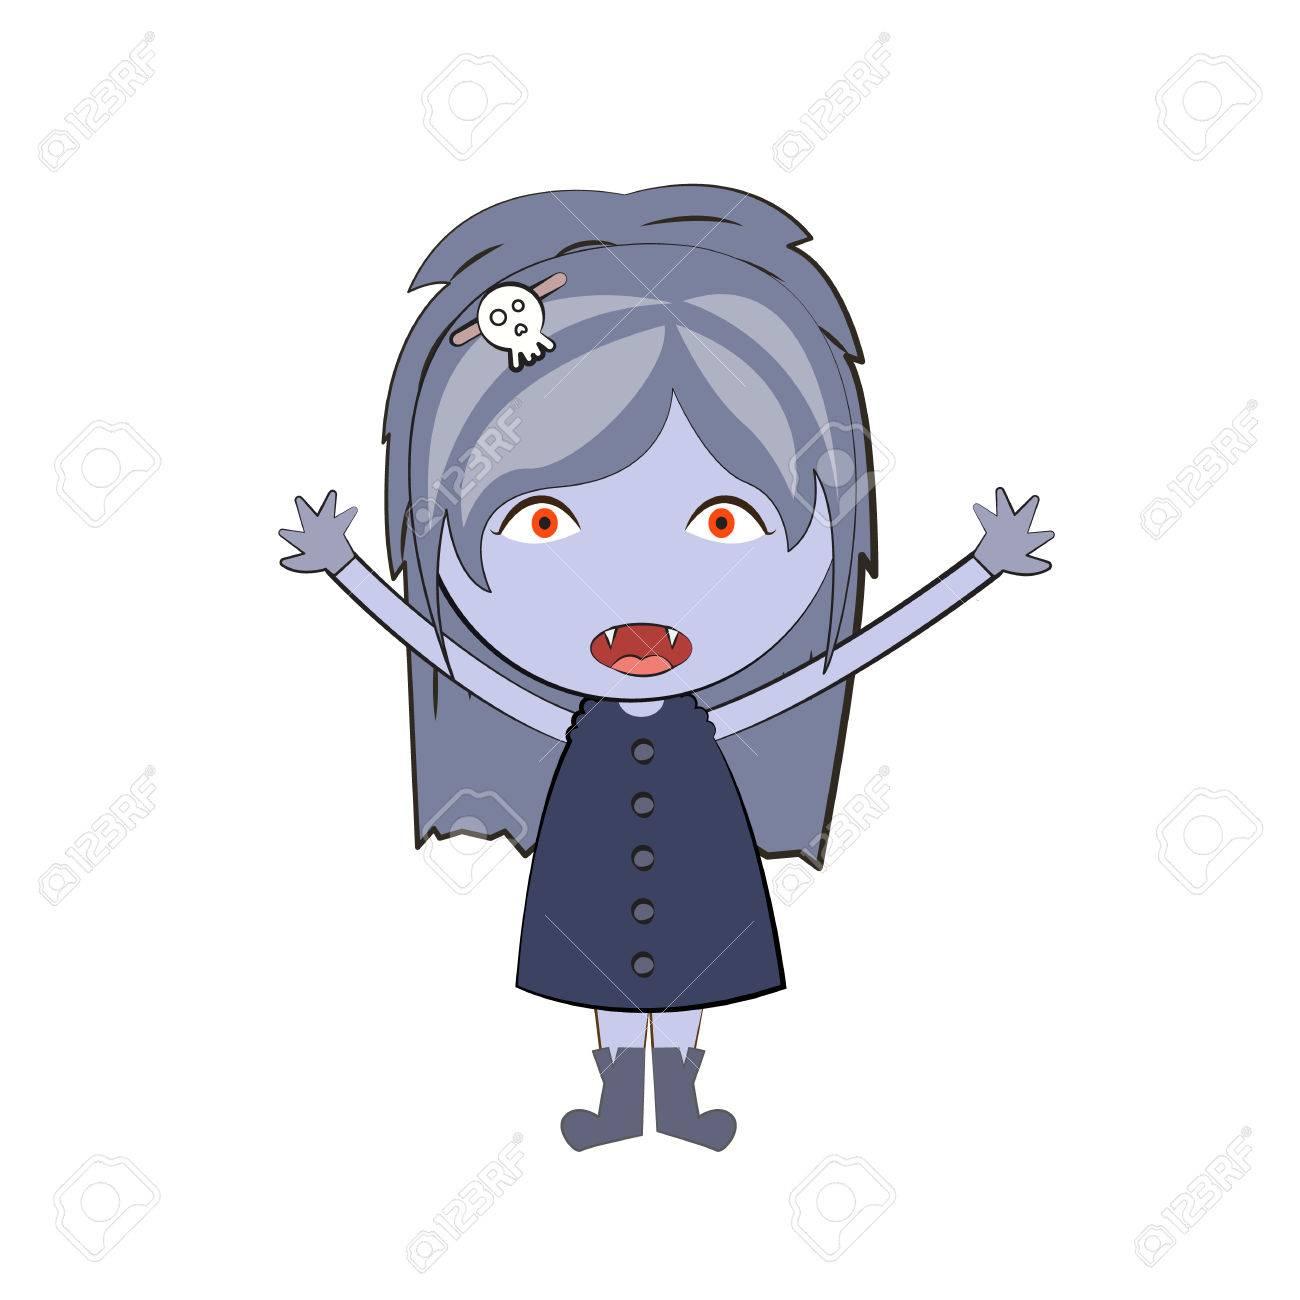 Cartoon Happy Vampire Girl Cute Doodles Drawings Royalty Free